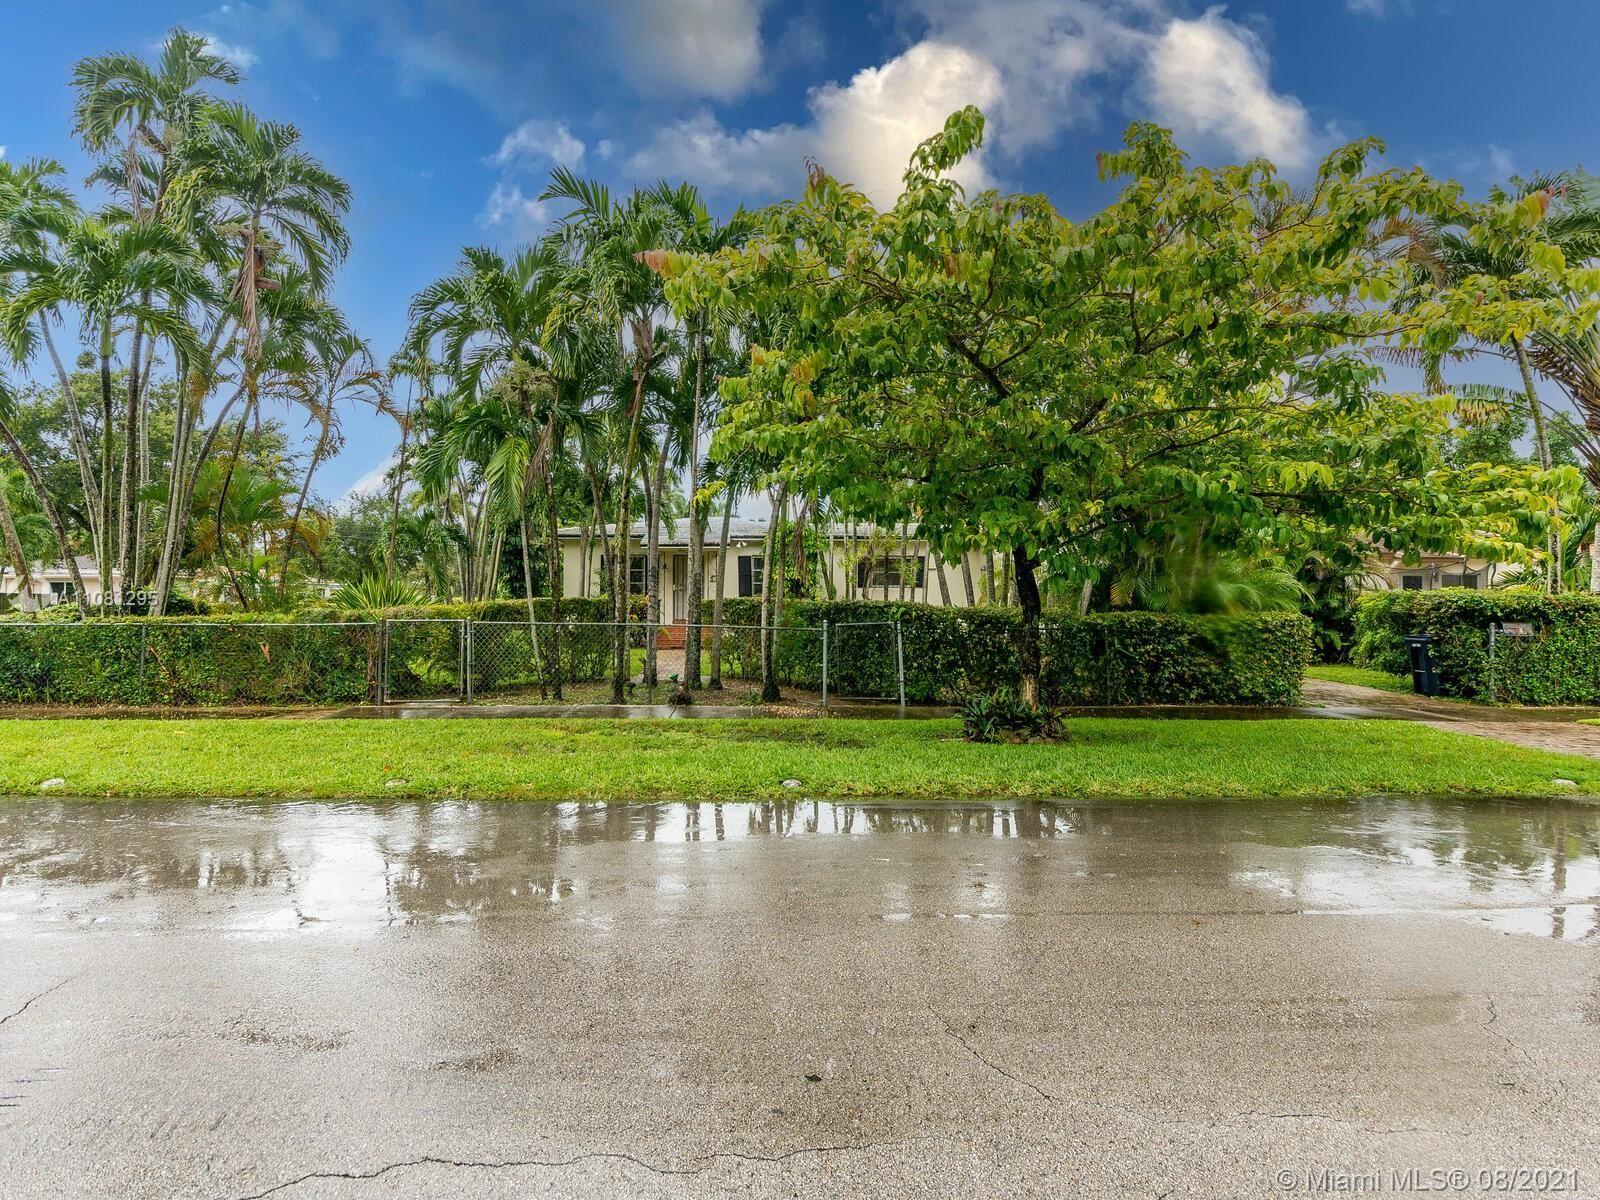 380 Morningside Dr, Miami Springs, FL 33166 - #: A11081295